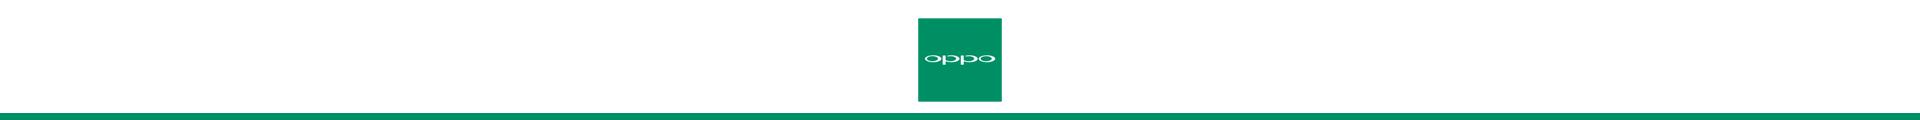 brand-oppo-line Phụ Kiện Pico  Khuyến mại 12-12-2020